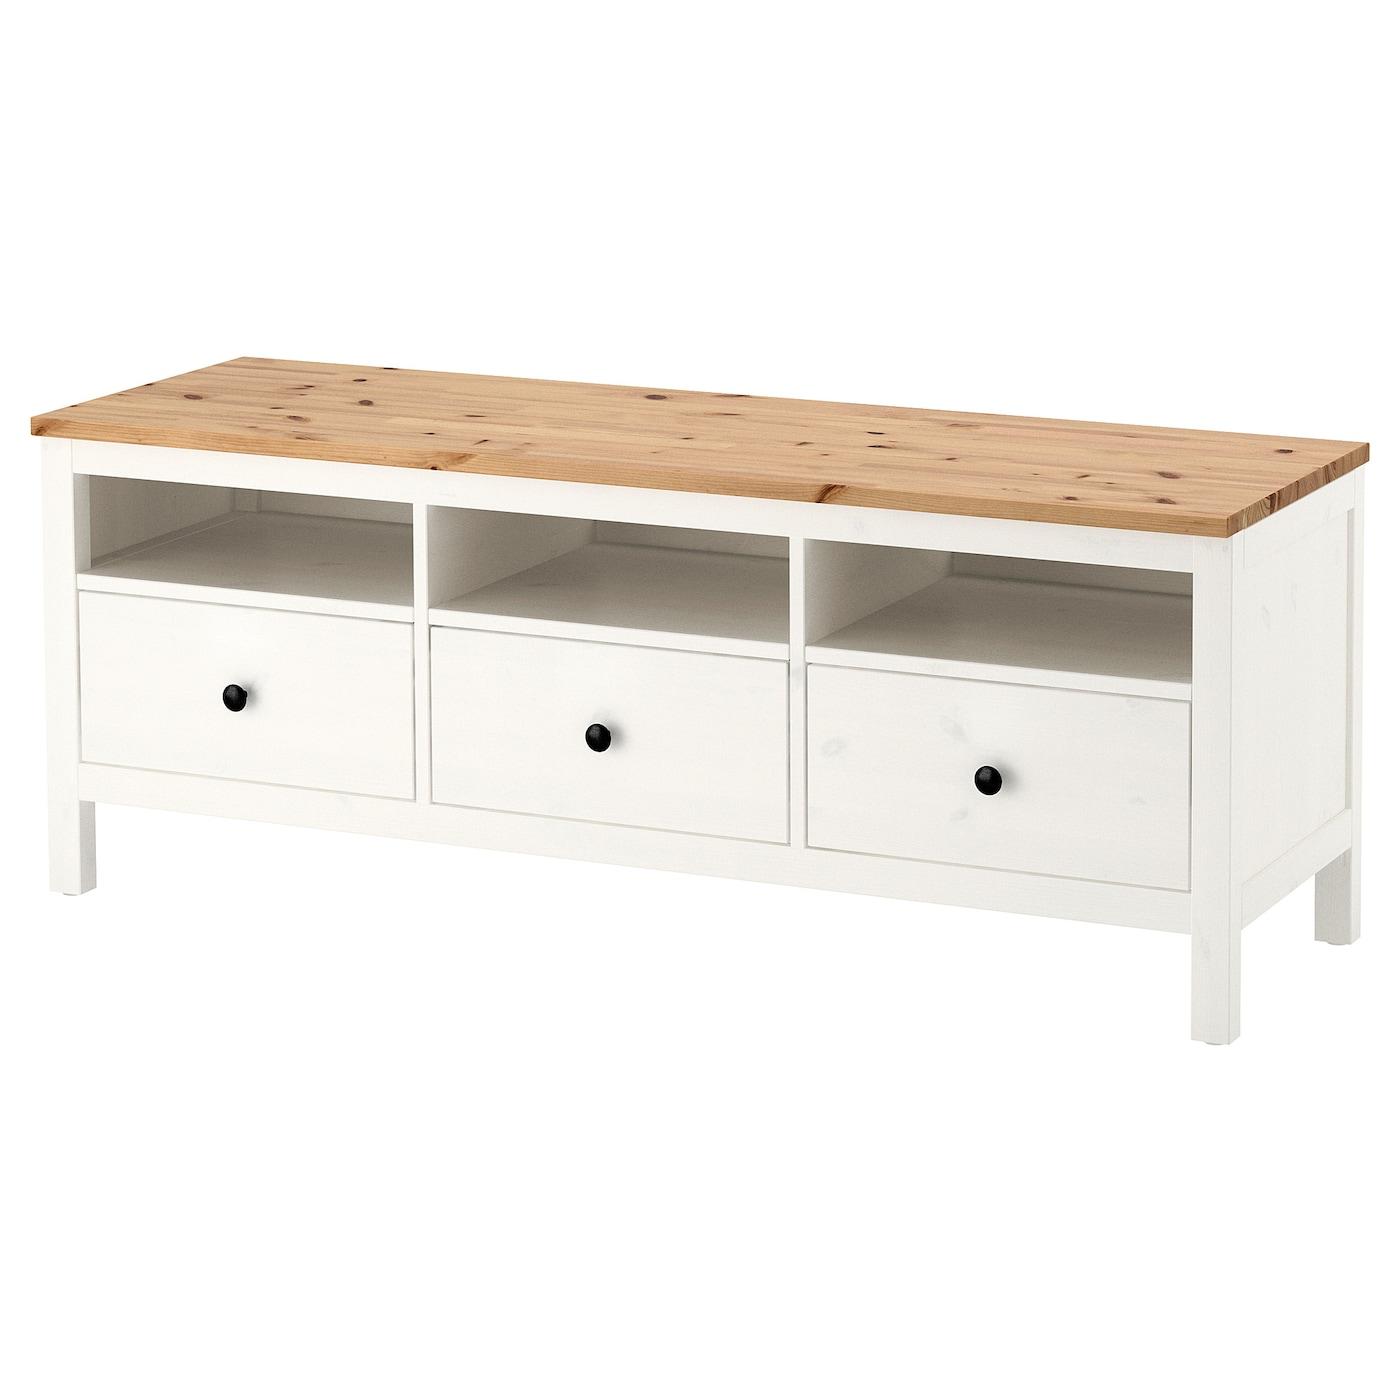 meubles tv design scandinave pas cher ikea. Black Bedroom Furniture Sets. Home Design Ideas